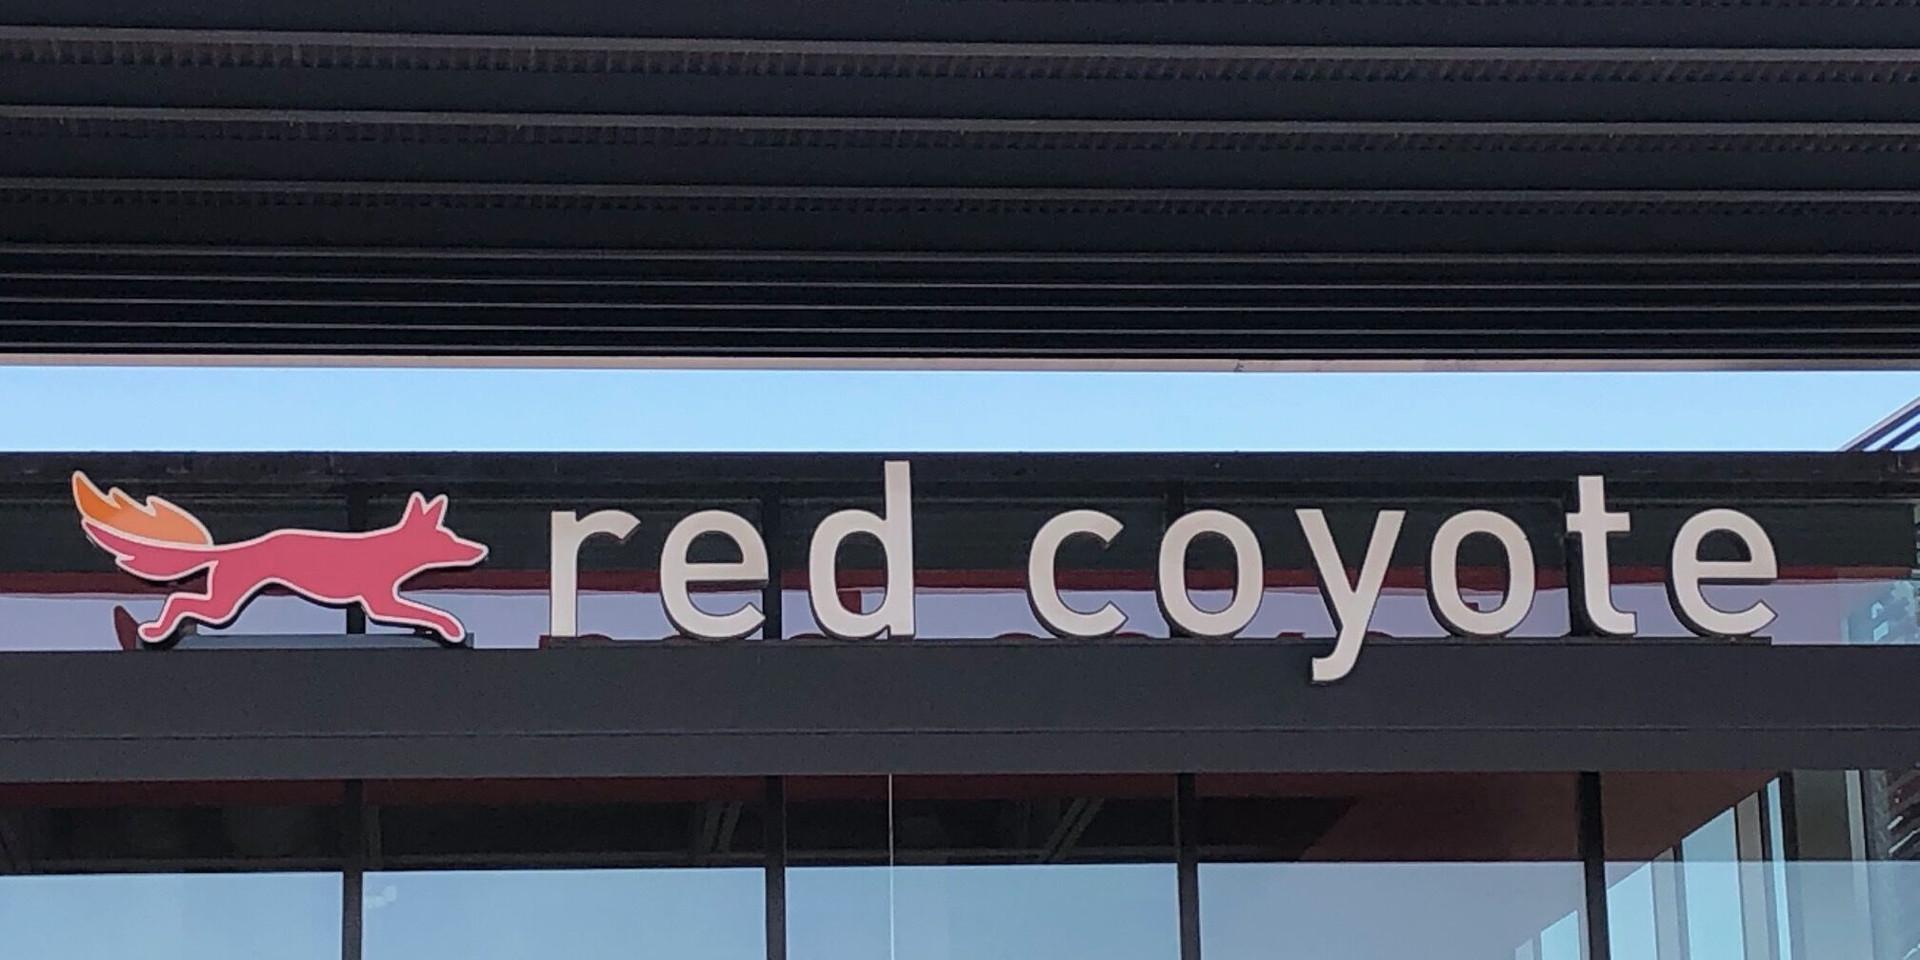 red coyote.jpeg